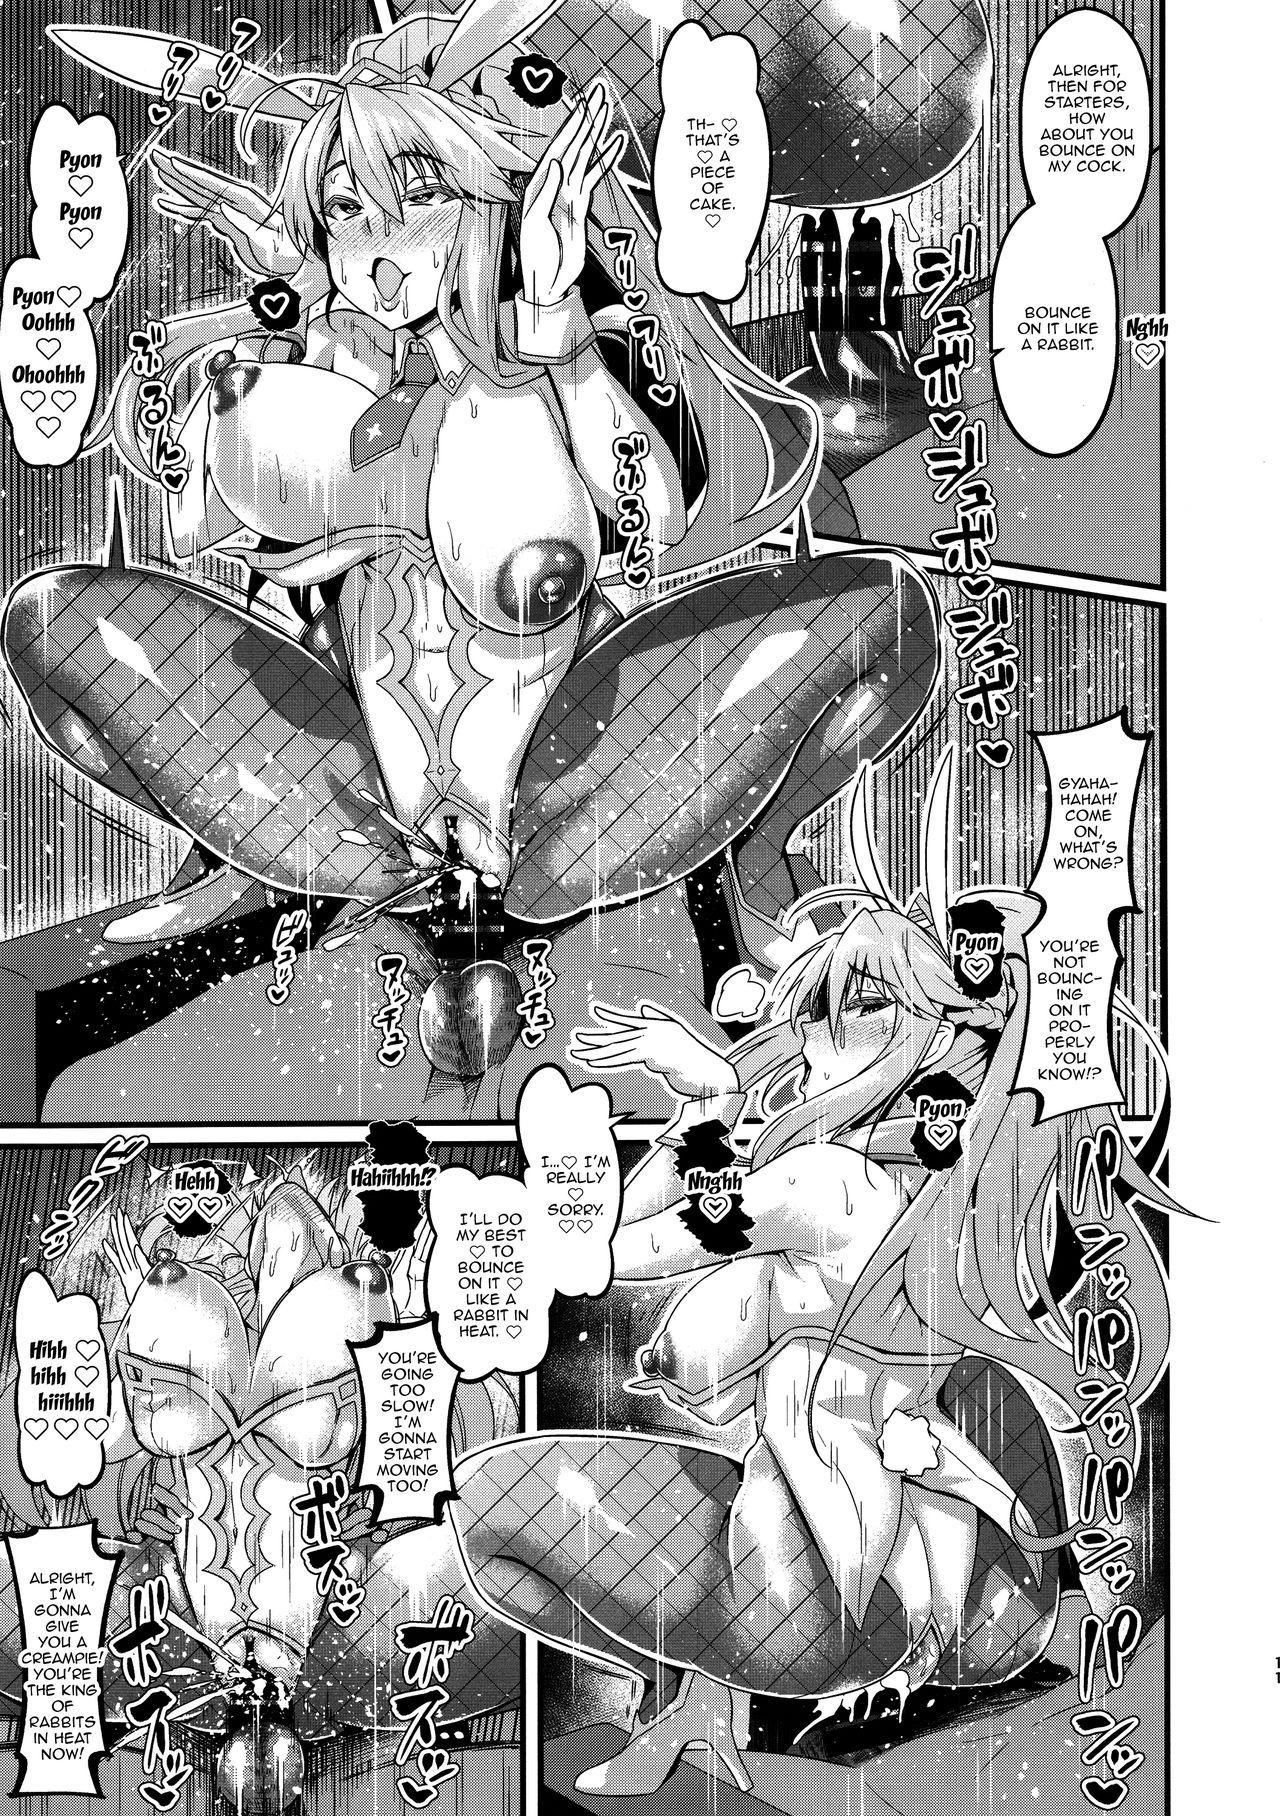 Las Vegas Bitch Kengou Sex Nanairo Shoubu   The Seven Colored Duels of the Slutty Swordmasters in Las Vegas 9